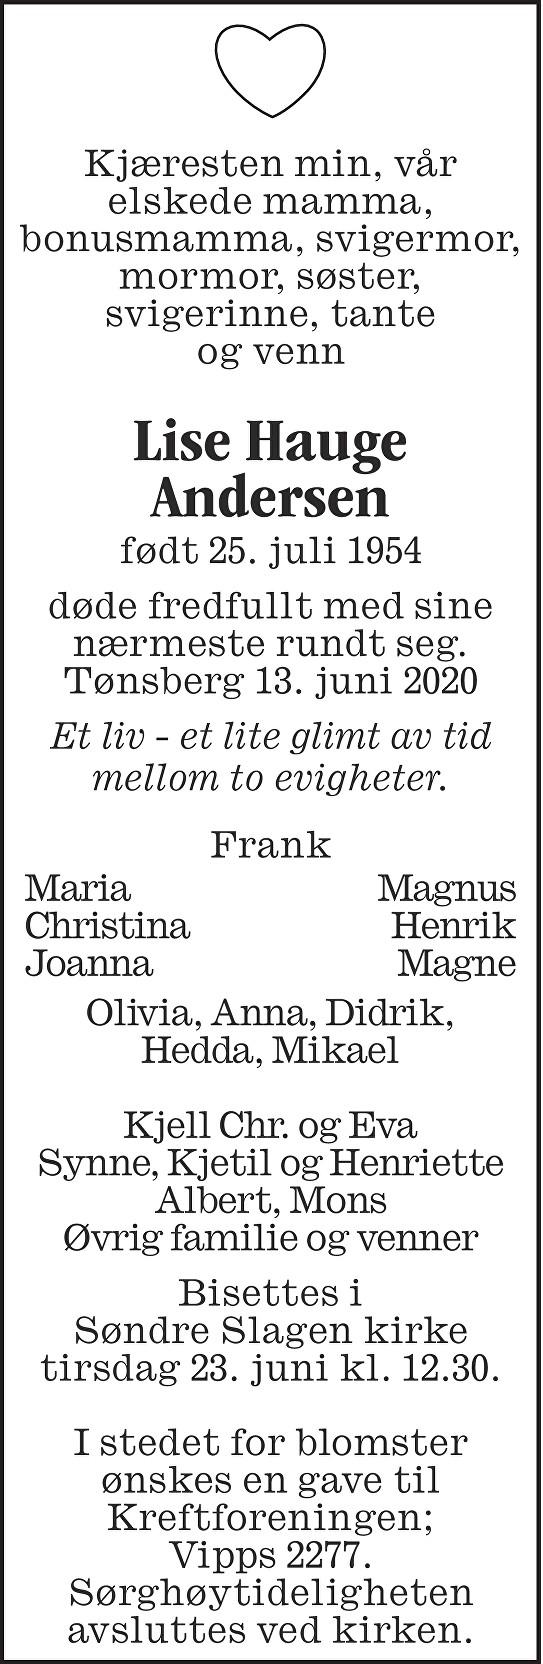 Lise Hauge Andersen Dødsannonse